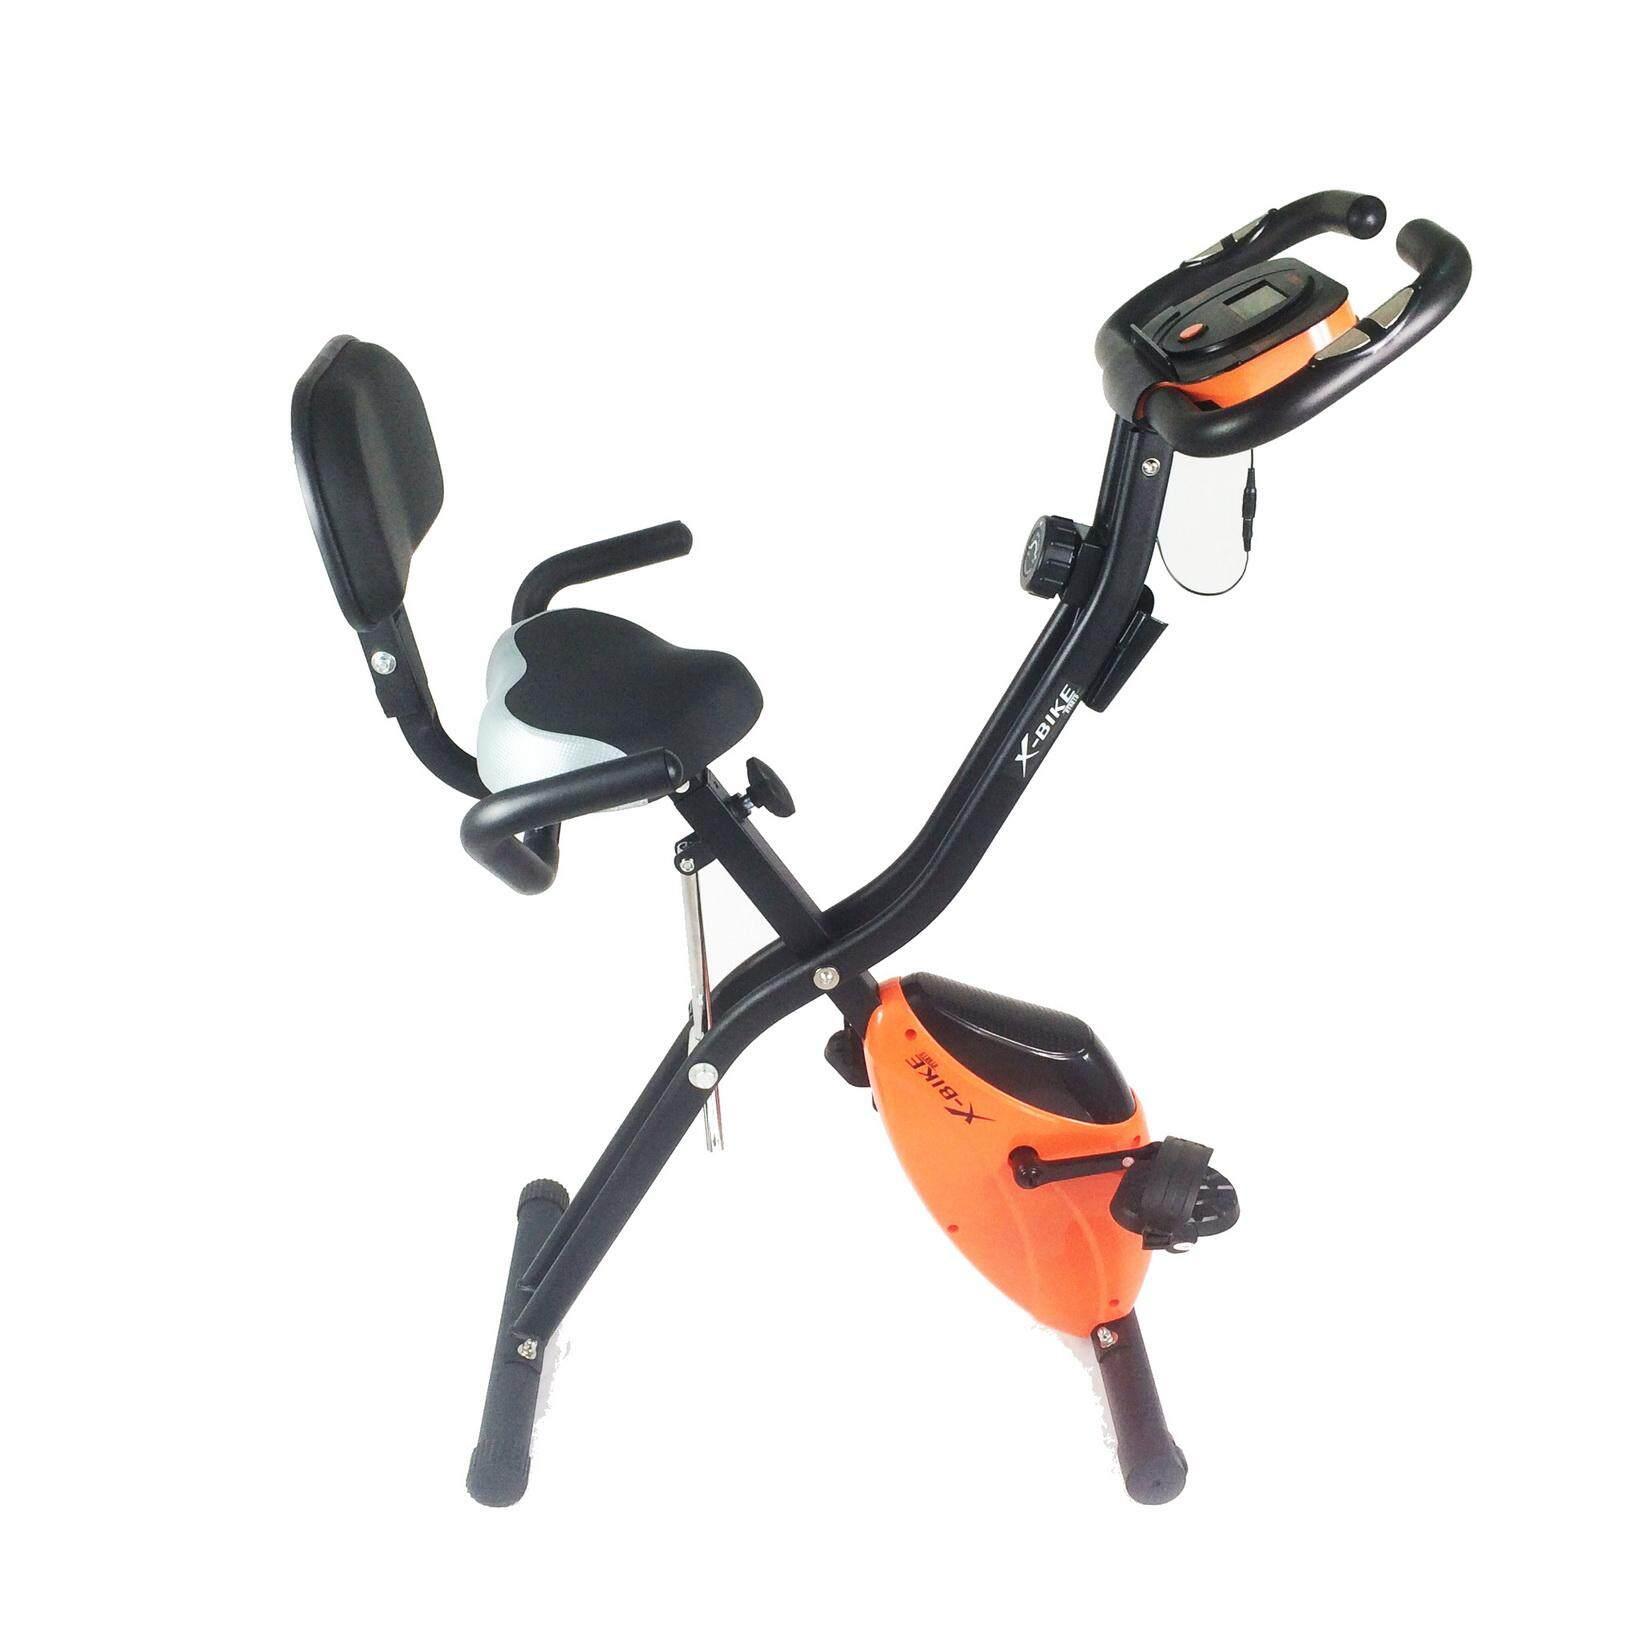 X-Bike จักรยานออกกำลังกายระบบแม่เหล็กแบบพับได้